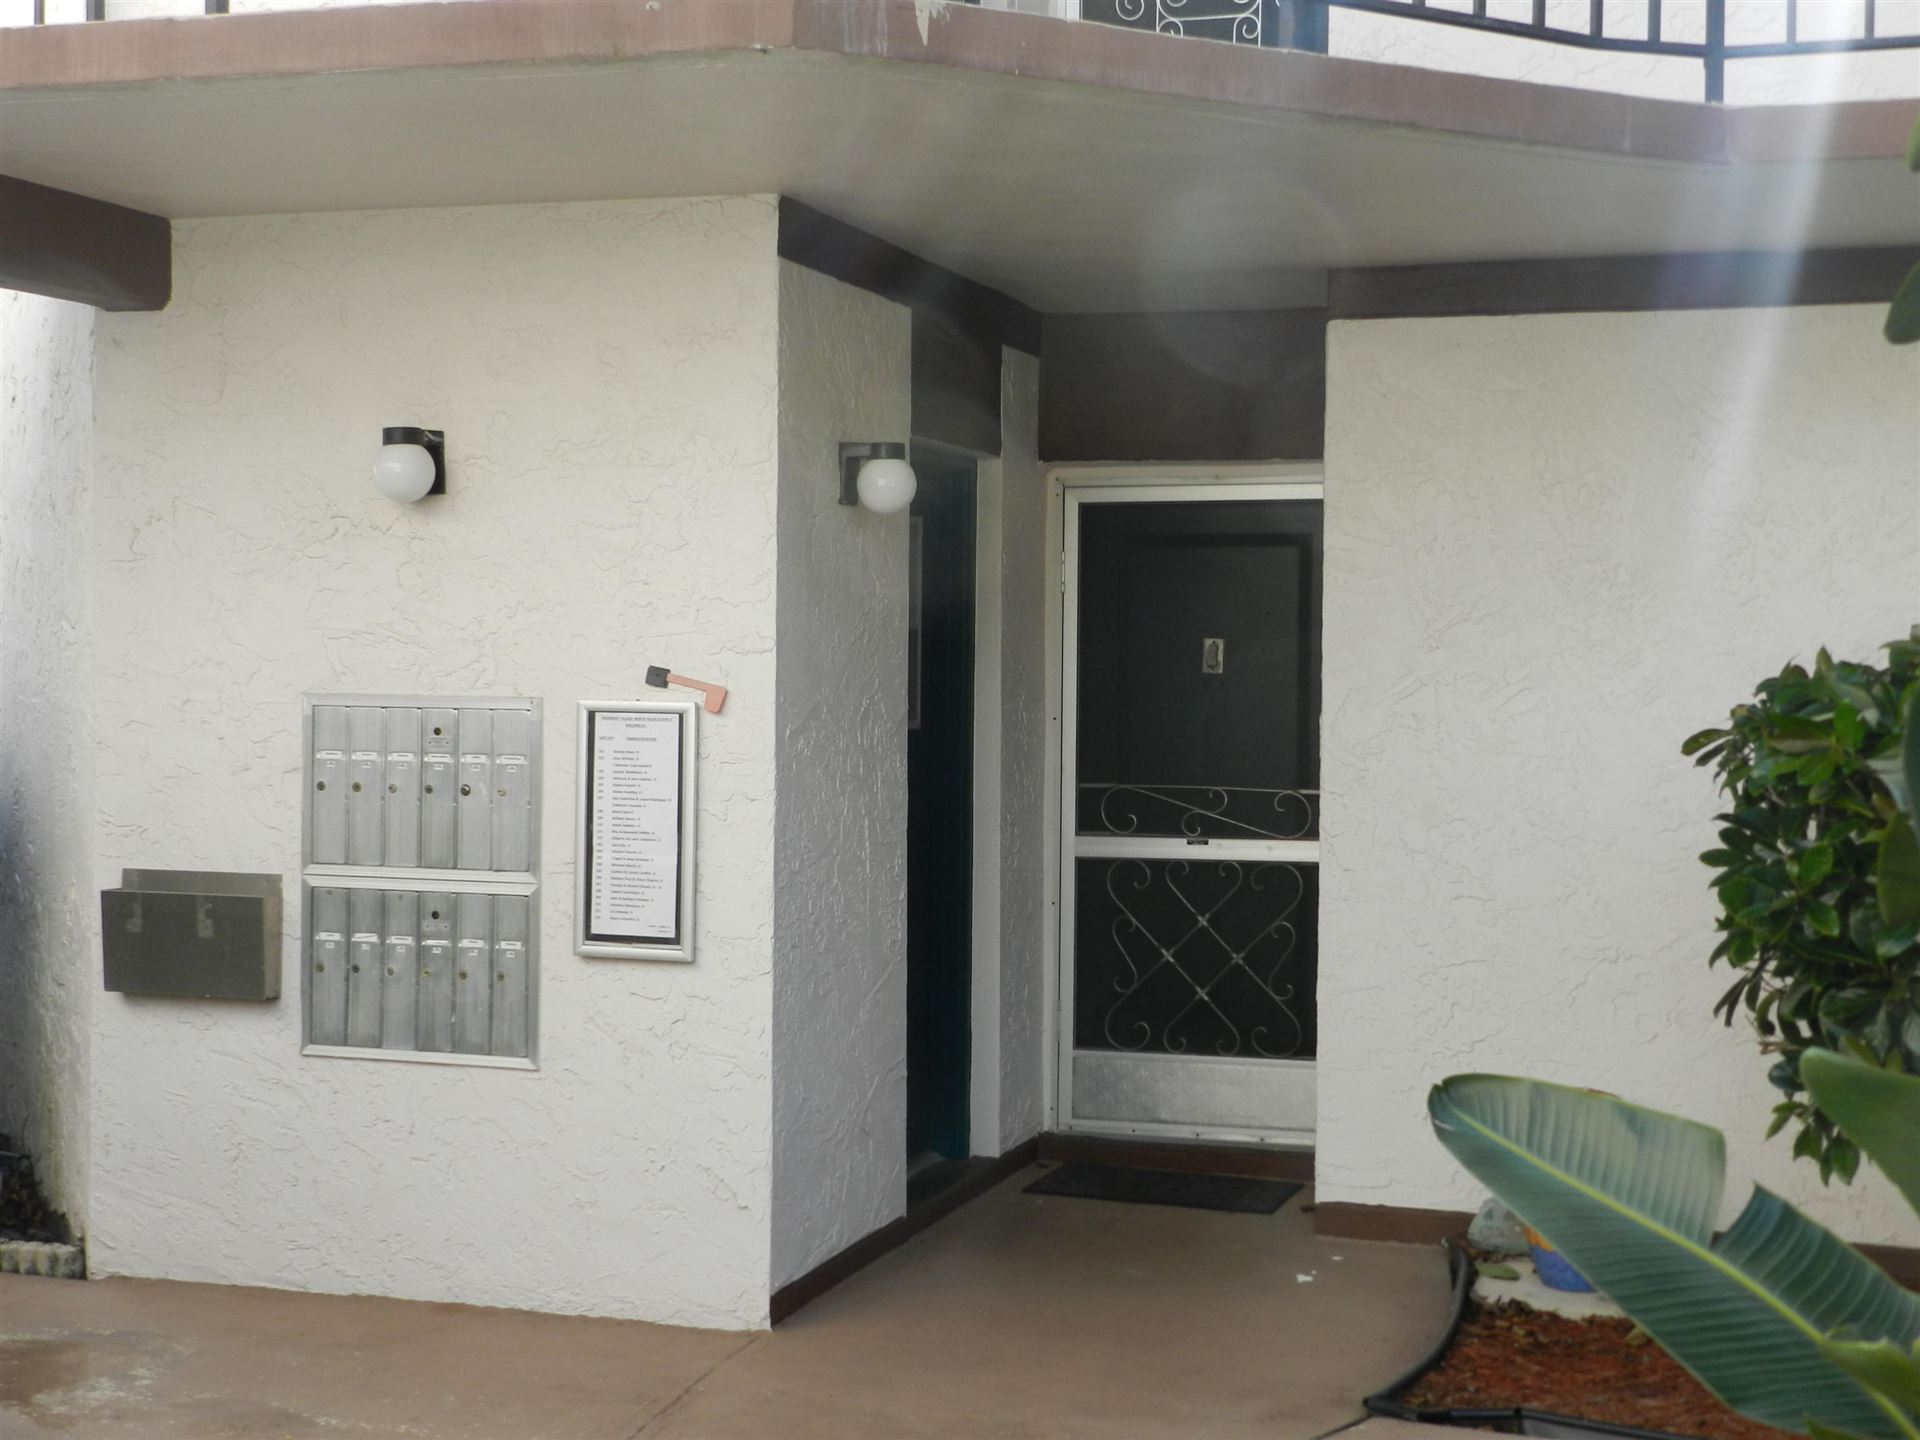 7 Greenway #106, Royal Palm Beach, FL 33411 - #: RX-10672327